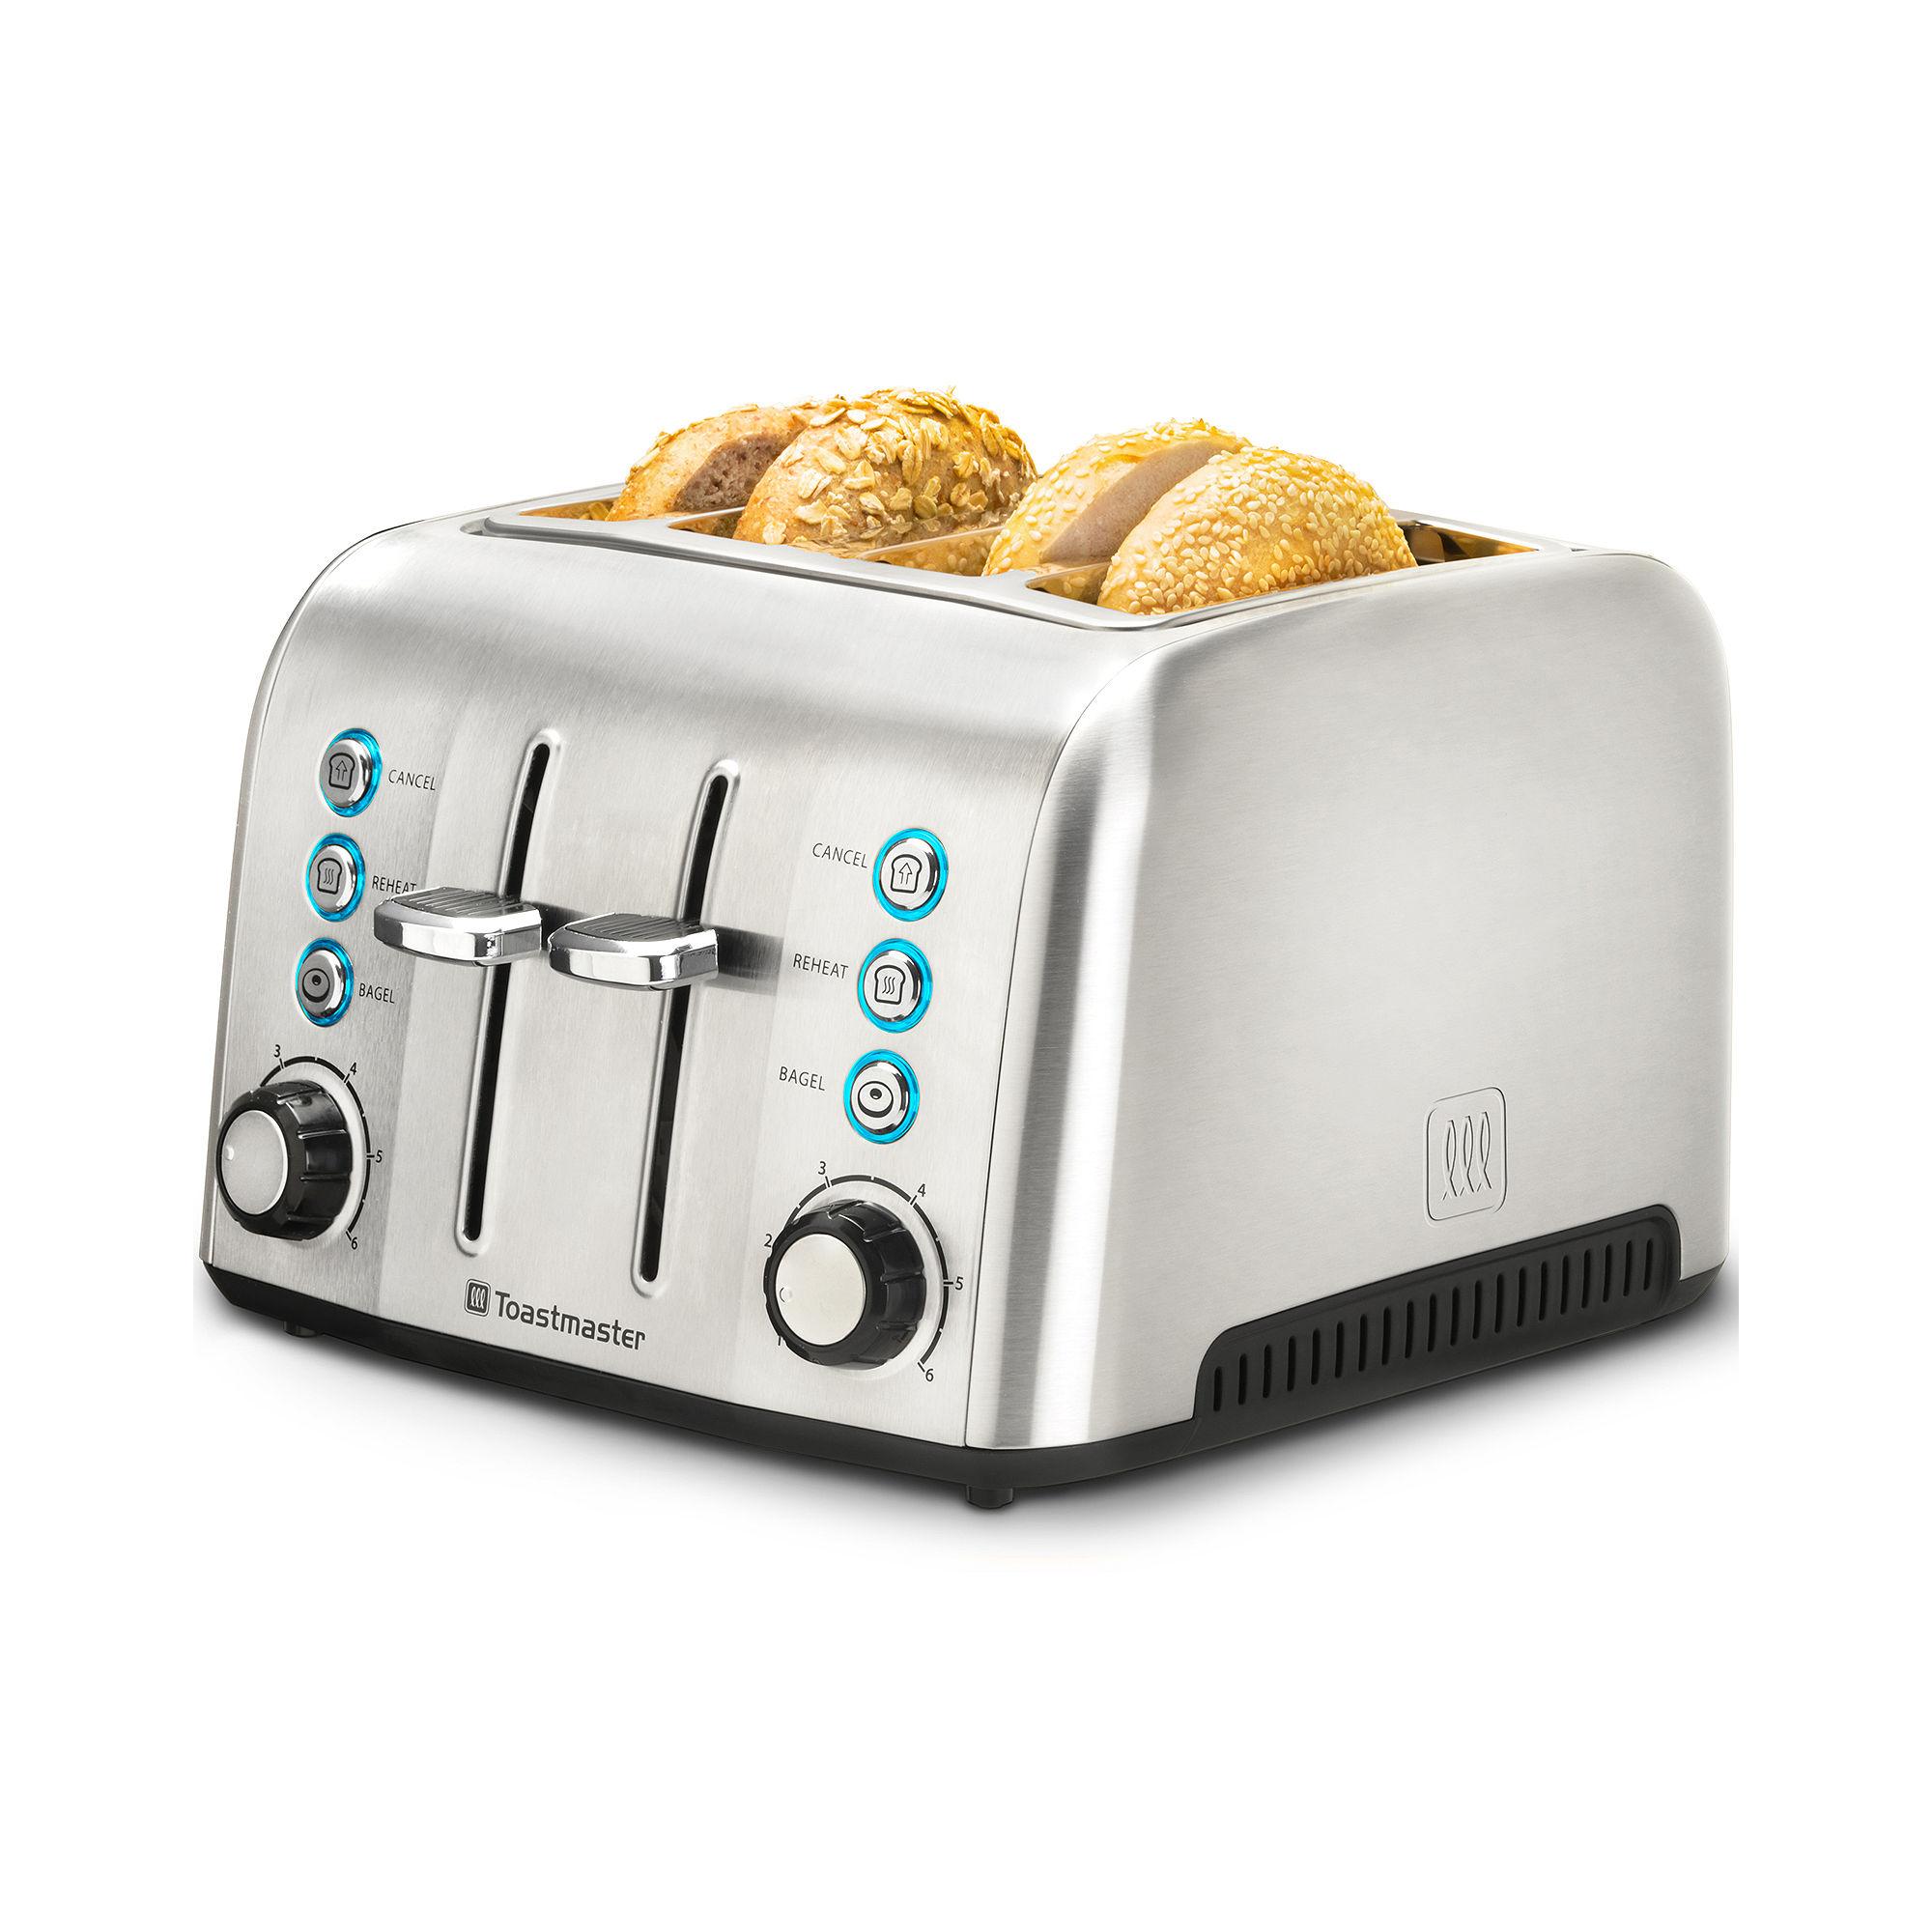 Toastmaster Stainless Steel 4-Slice Slot Toaster